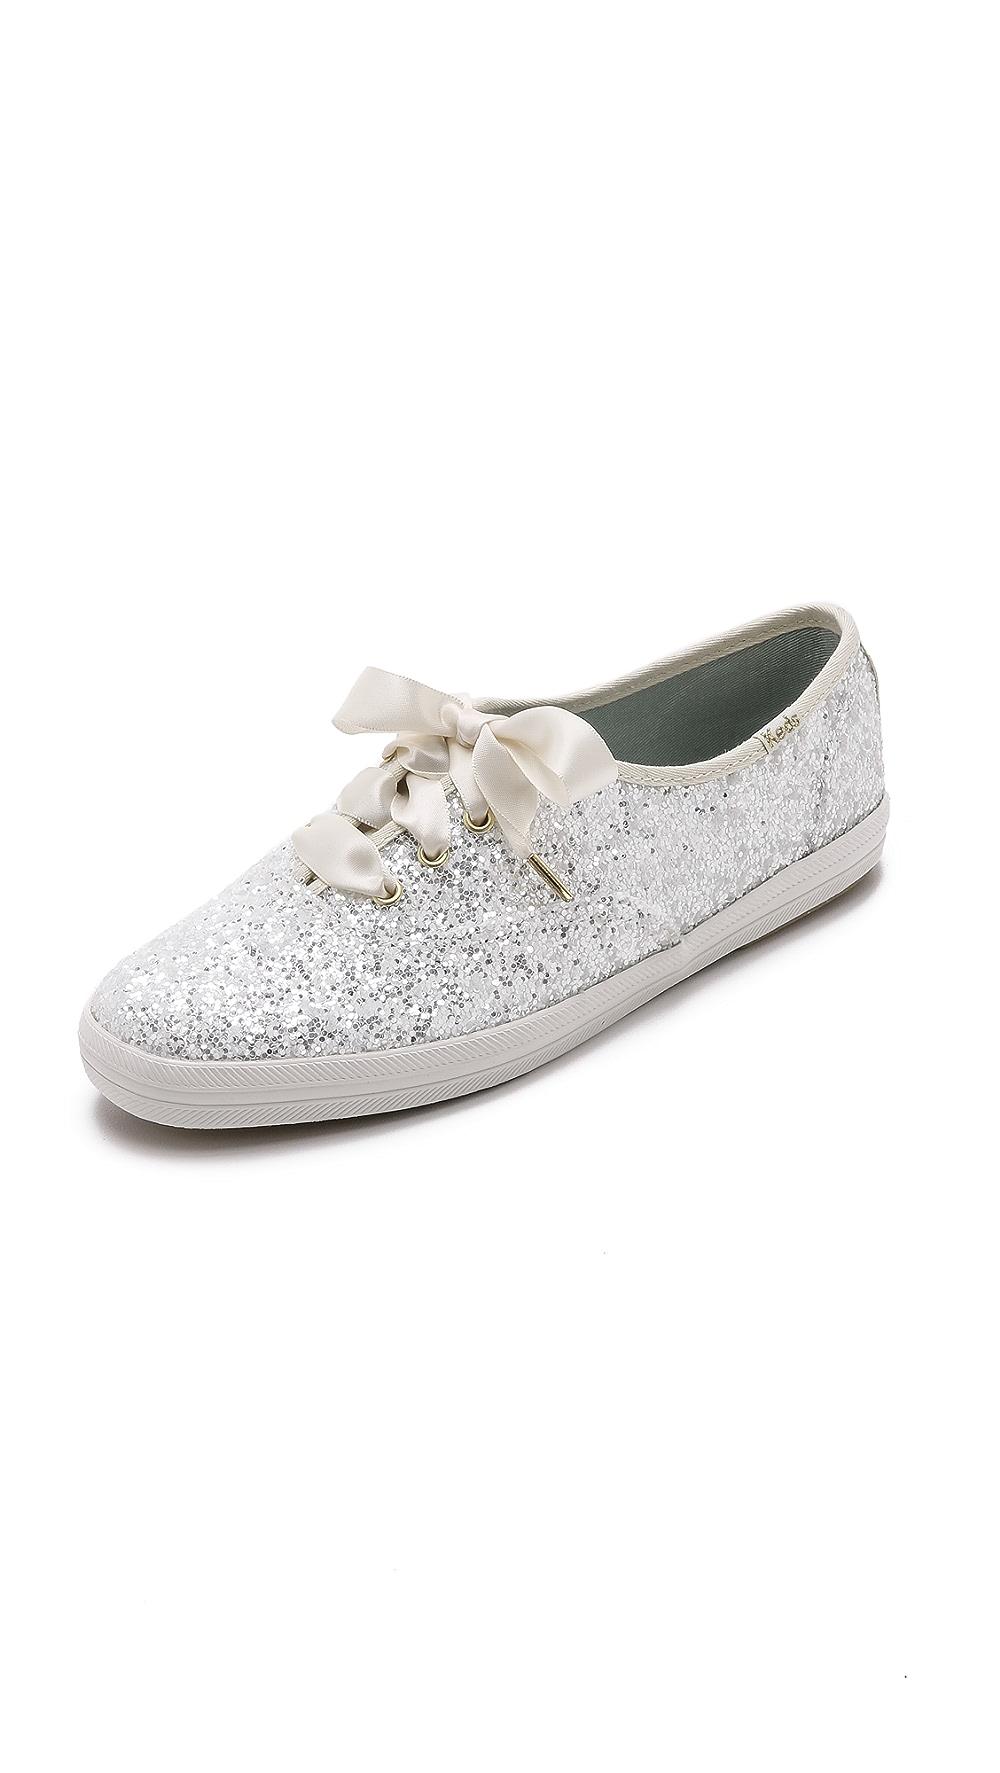 Kate Spade New York Glitter Keds Sneakers Shopbop